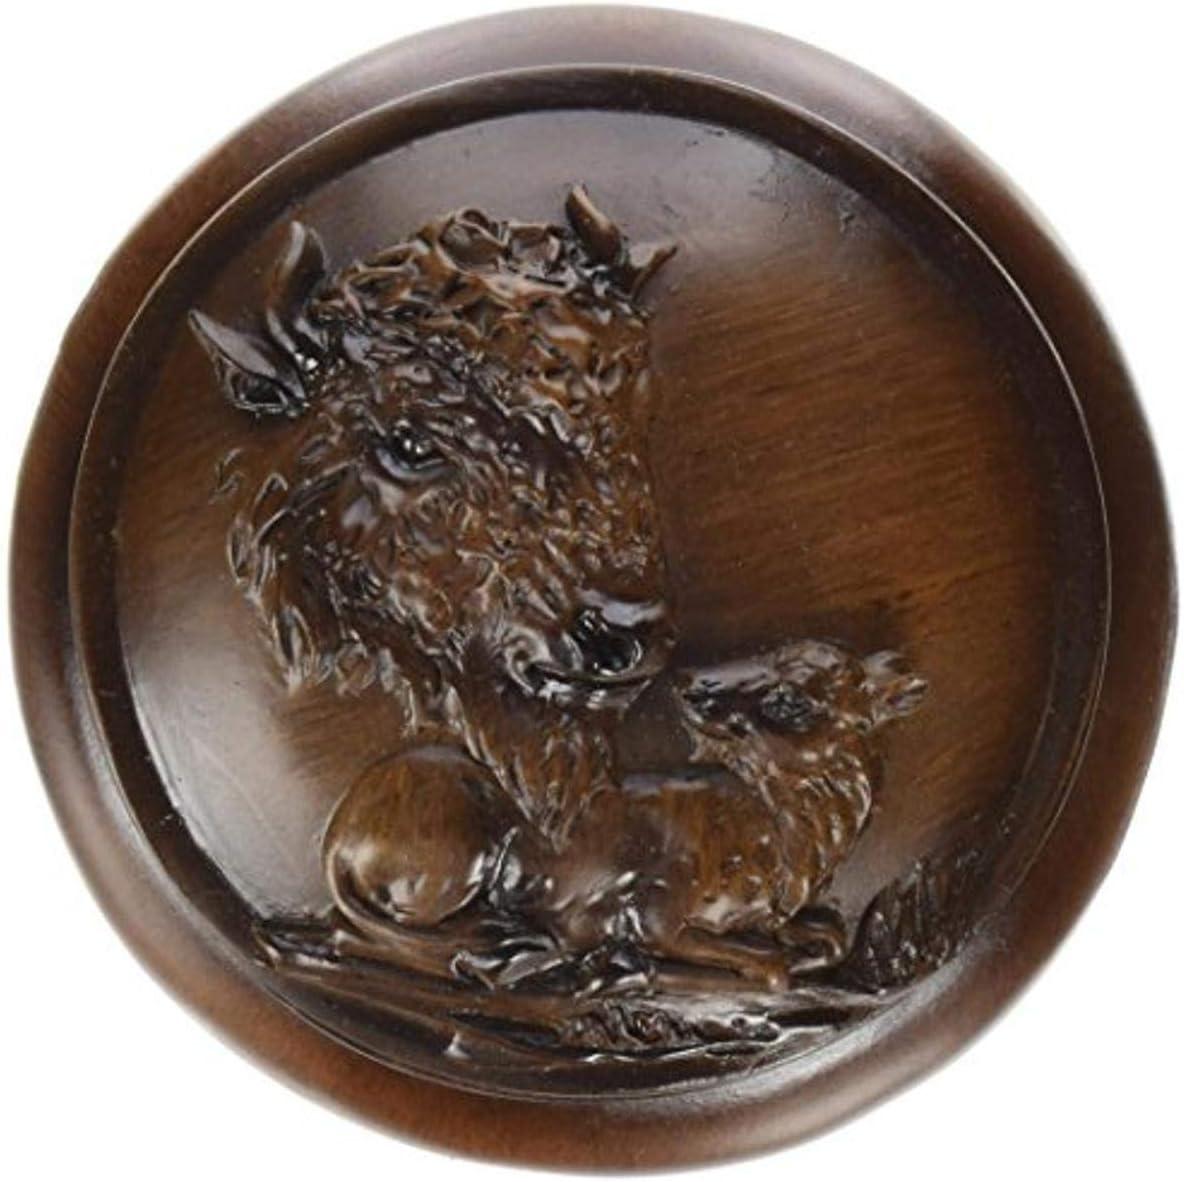 Genuine Free Shipping StealStreet Faux Wood Buffalo Cheap sale Jewelry Collectible De Box Trinket